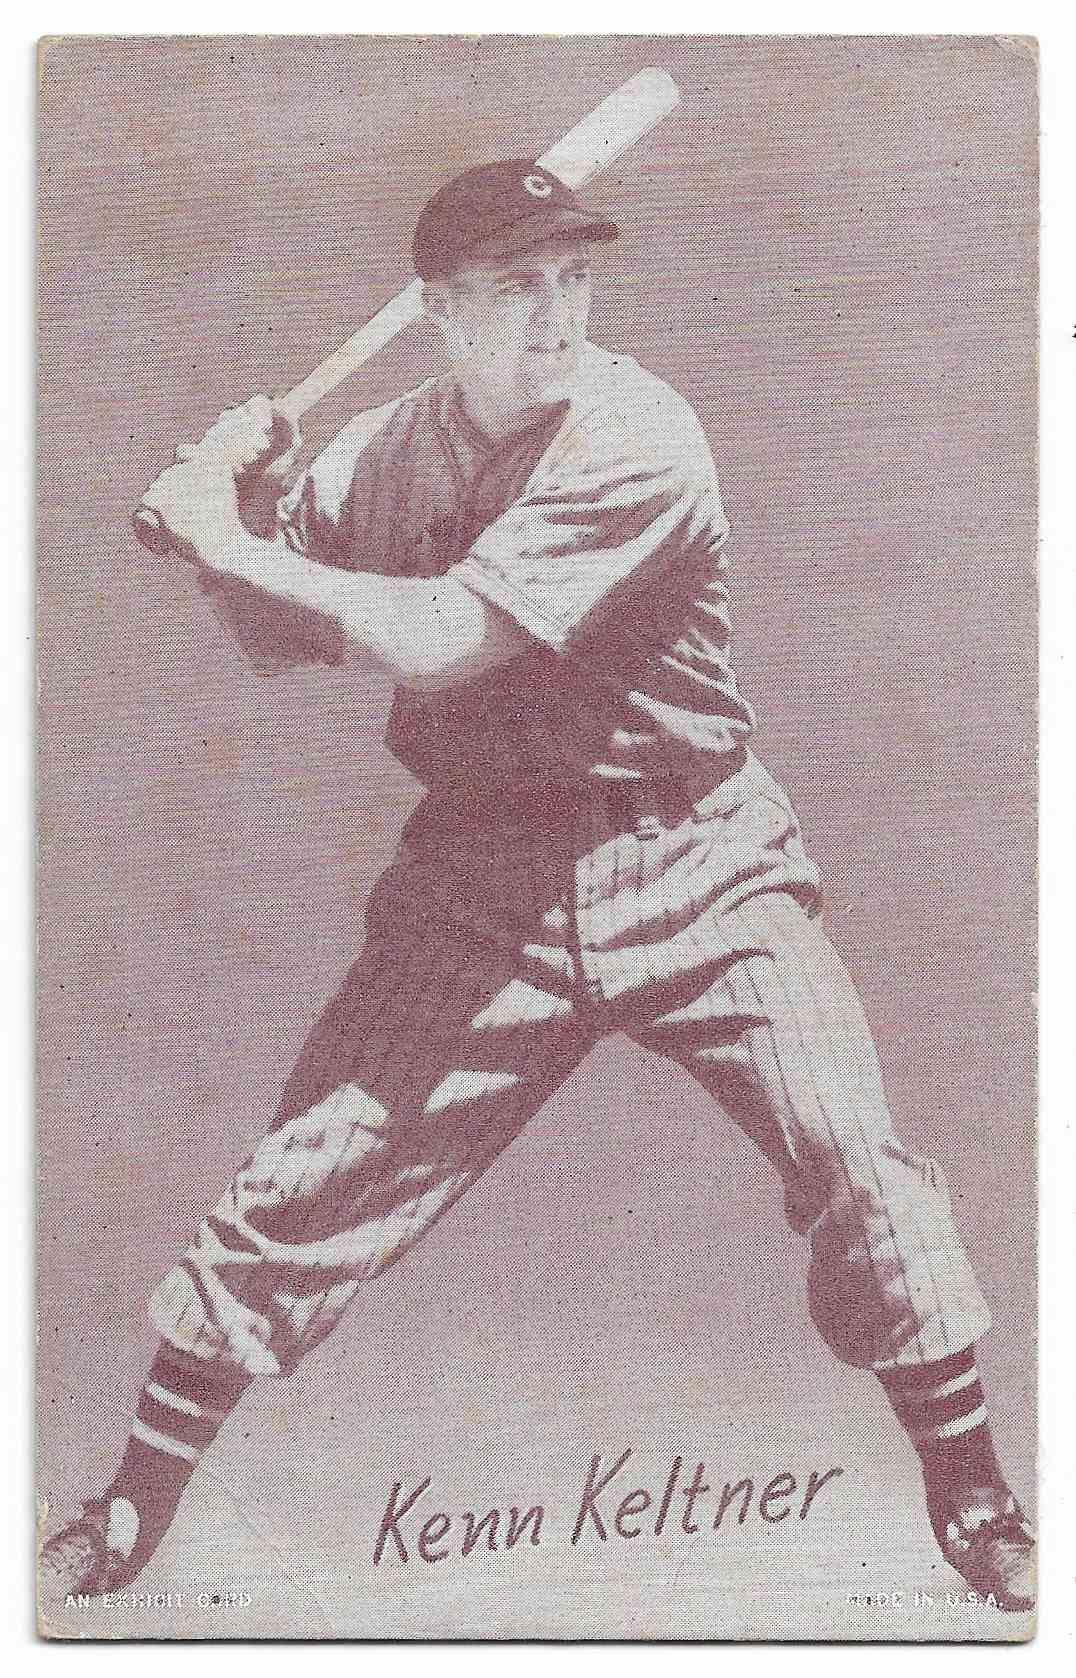 1947 Exhibits Kenn Keltner card front image